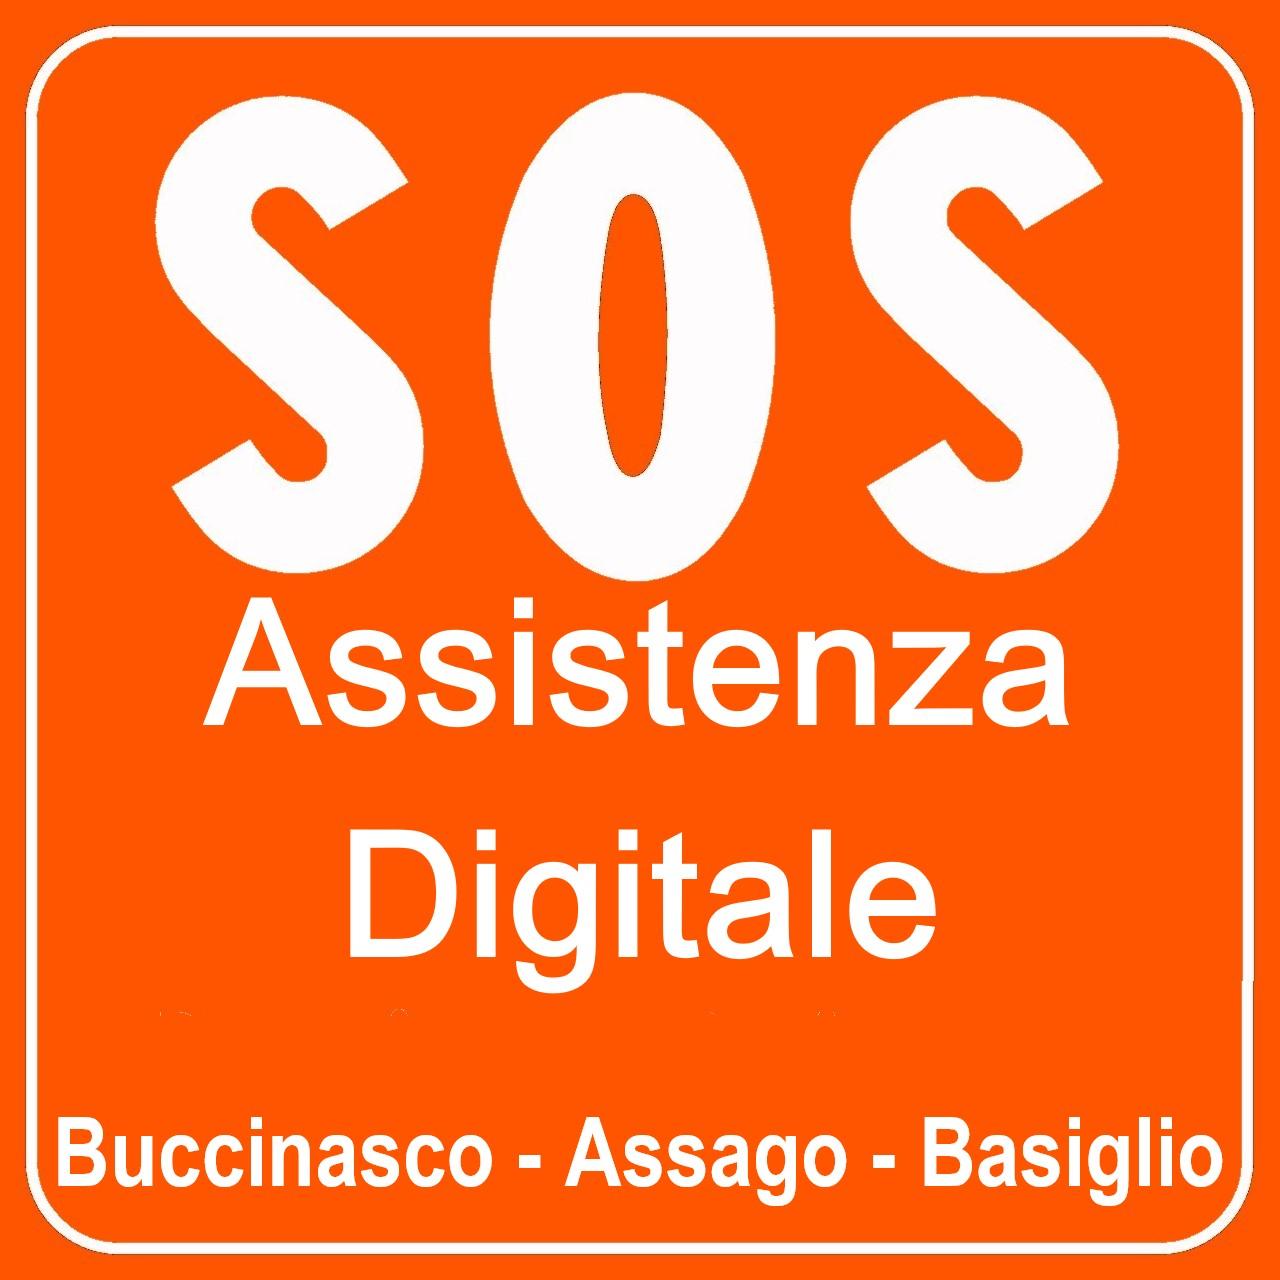 Assistenza digitale